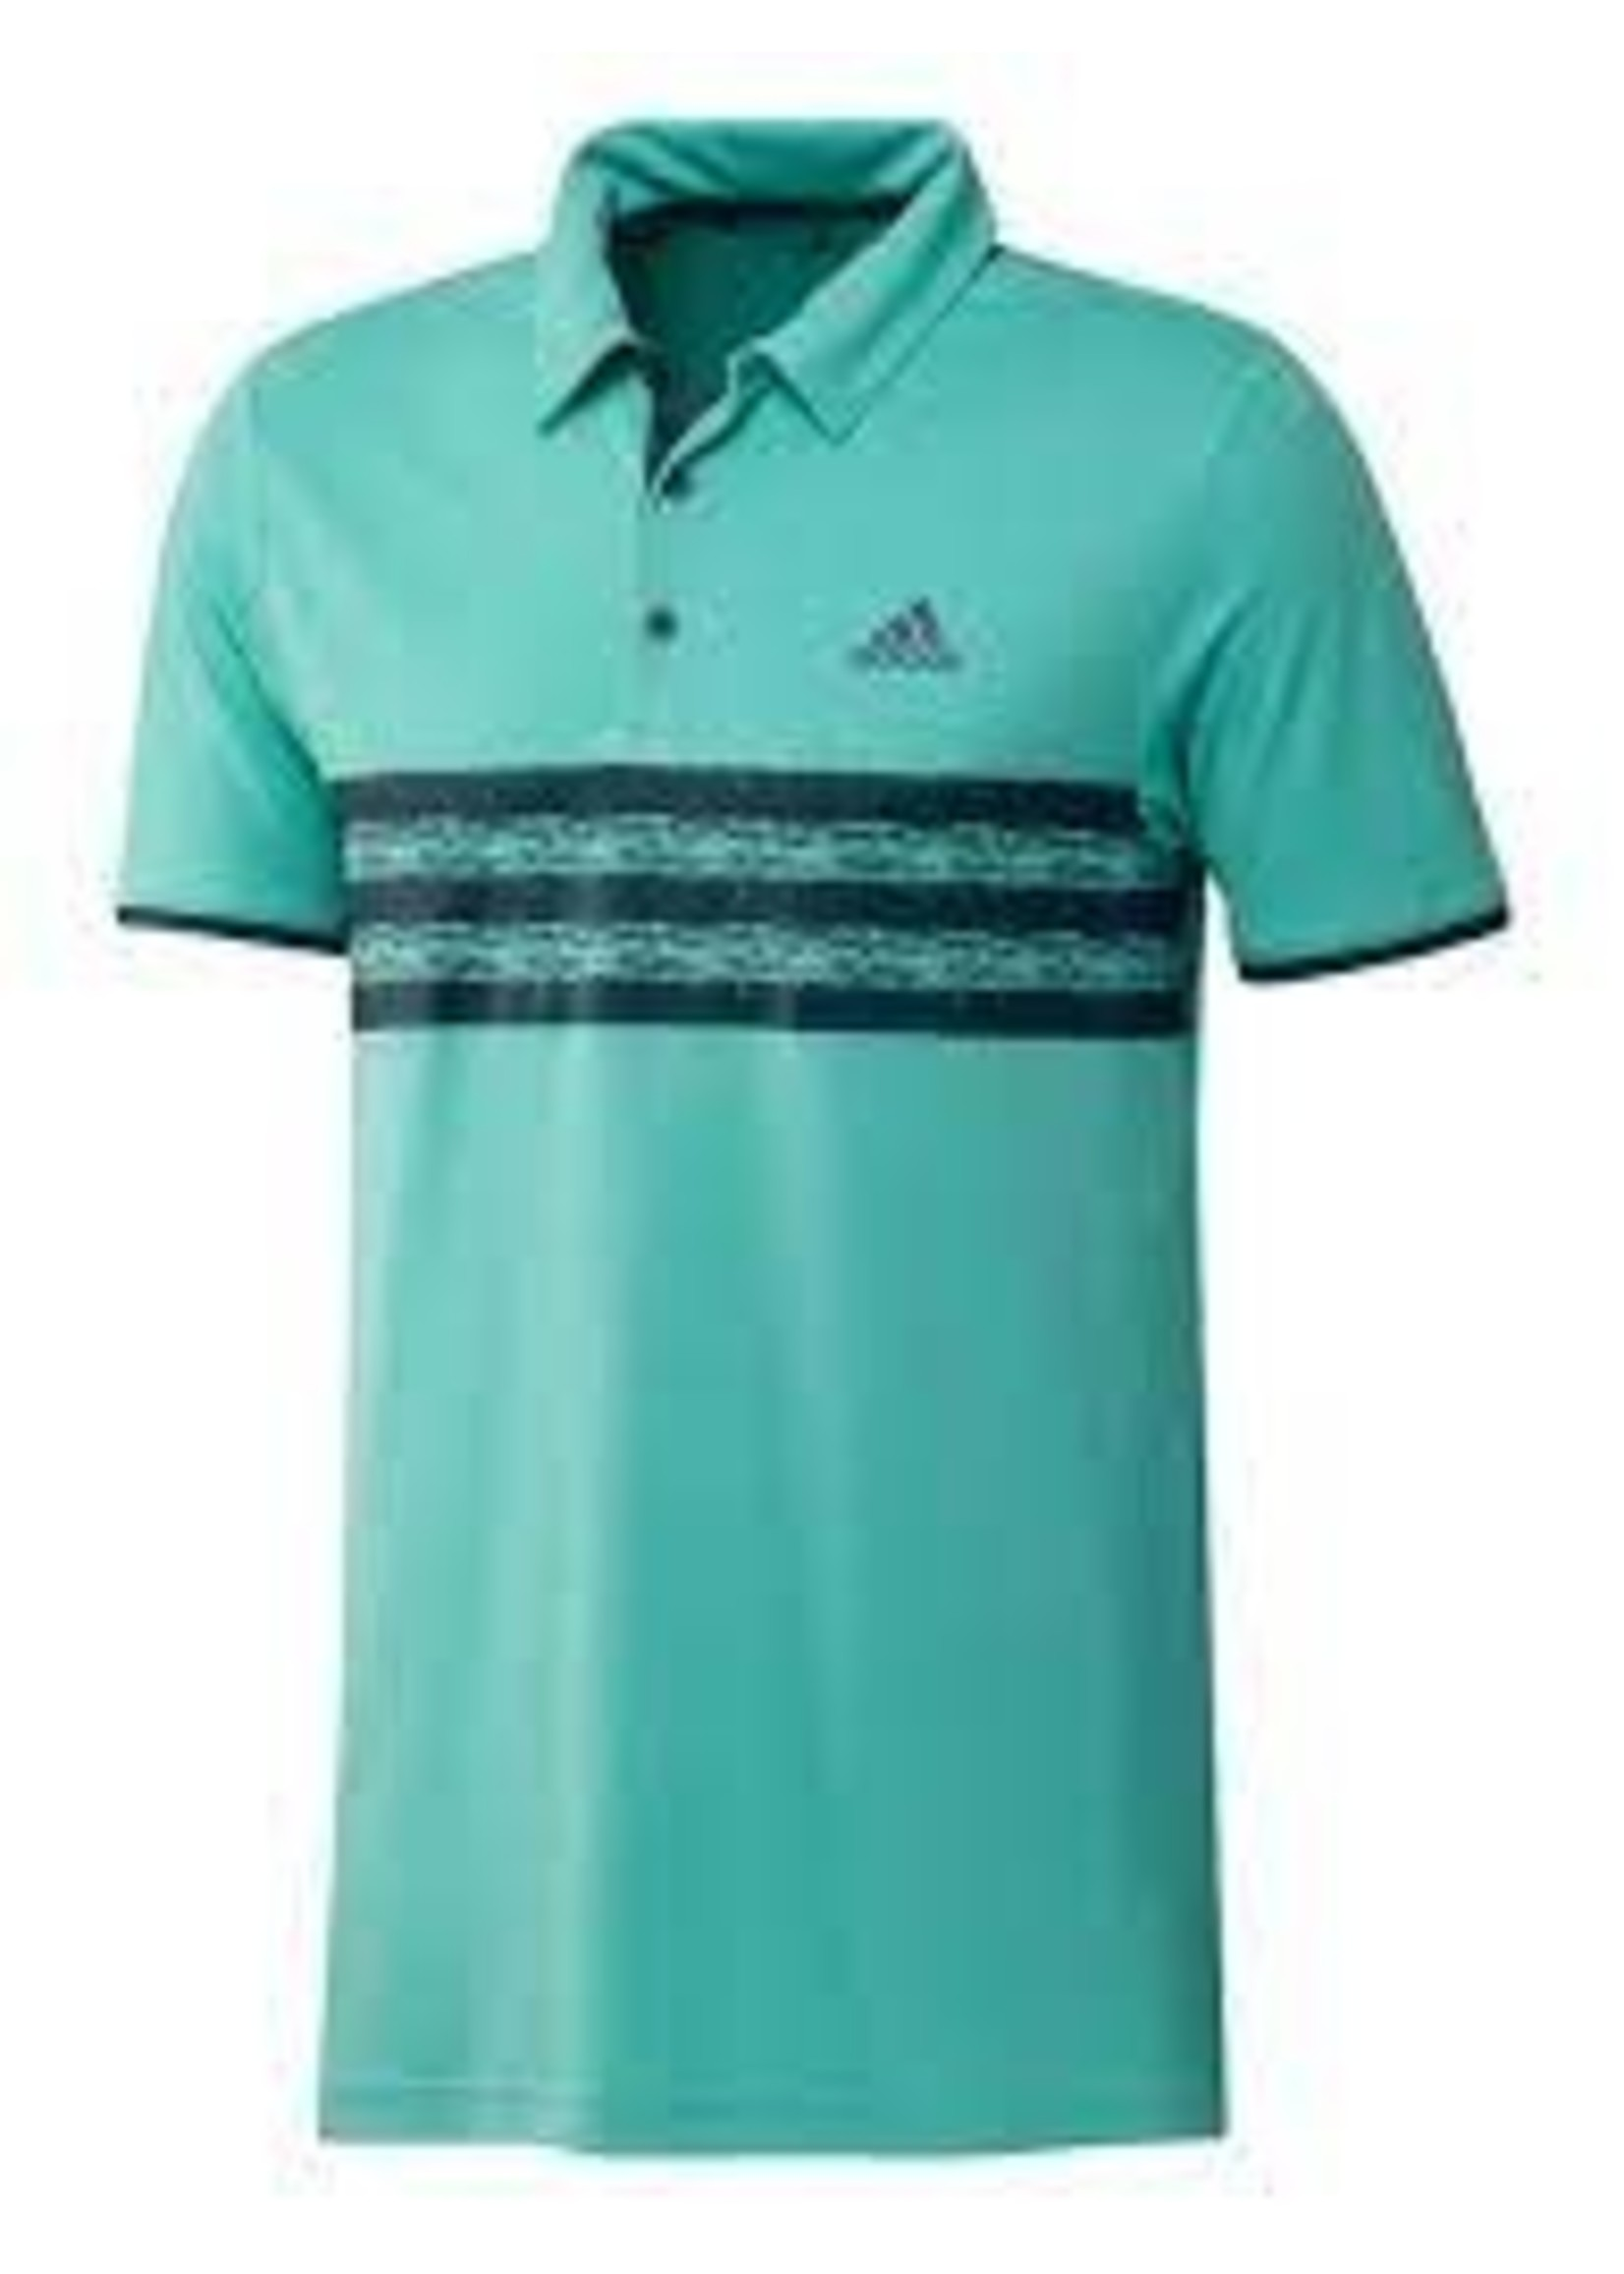 Adidas Adidas Core Golf Mens Polo Shirt,  Acid Mint/Wild Teal, (2021)